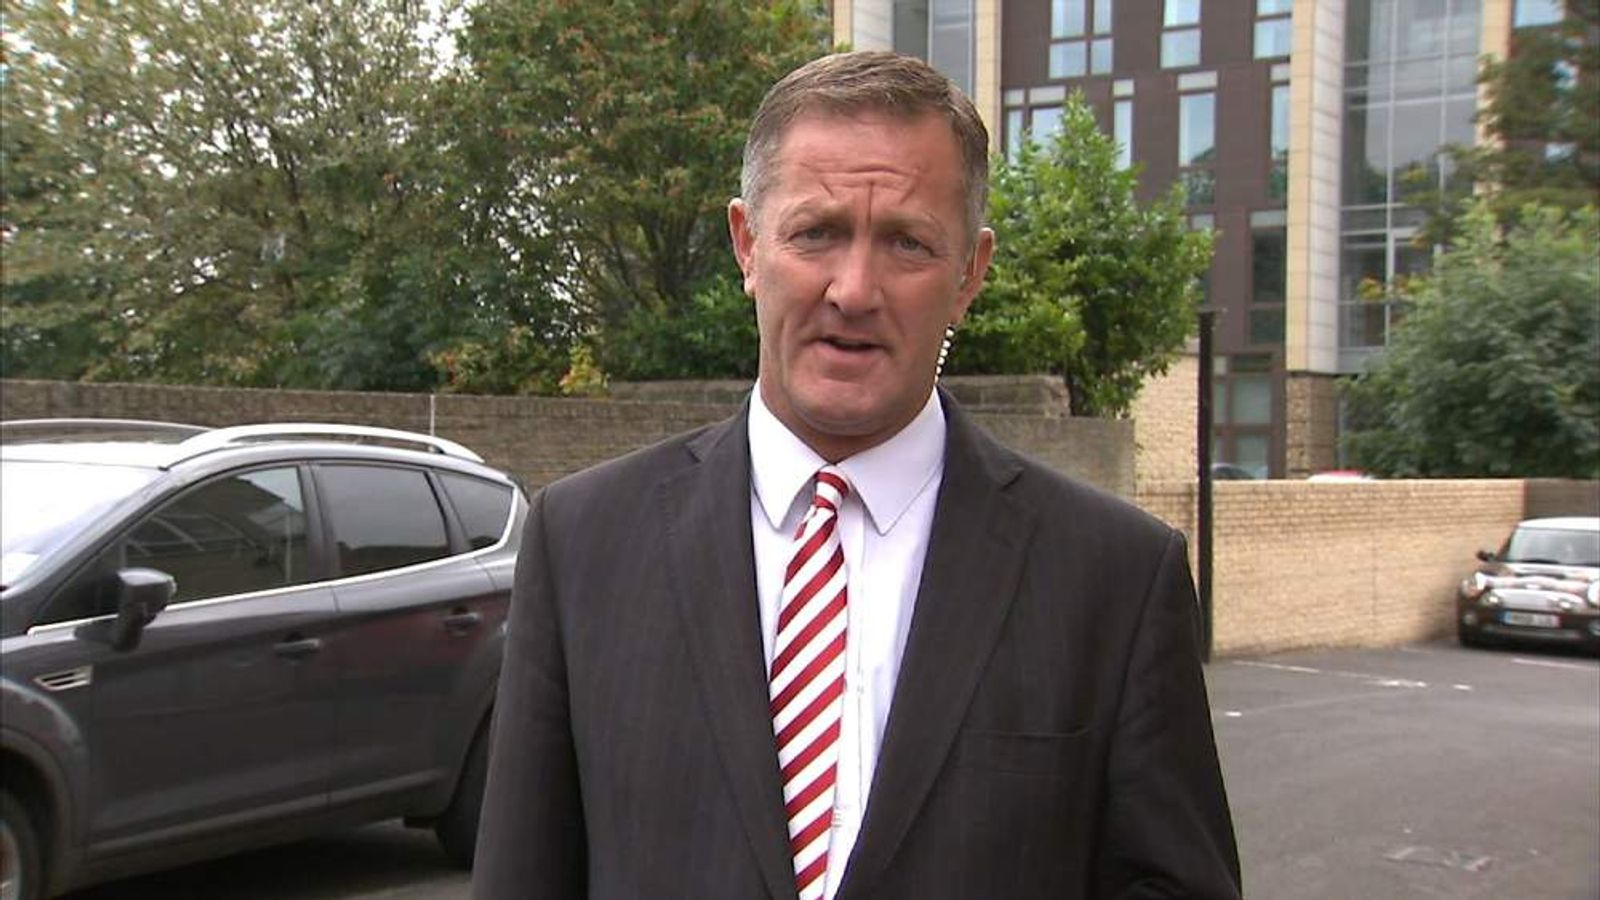 Rotherham abuse scandal